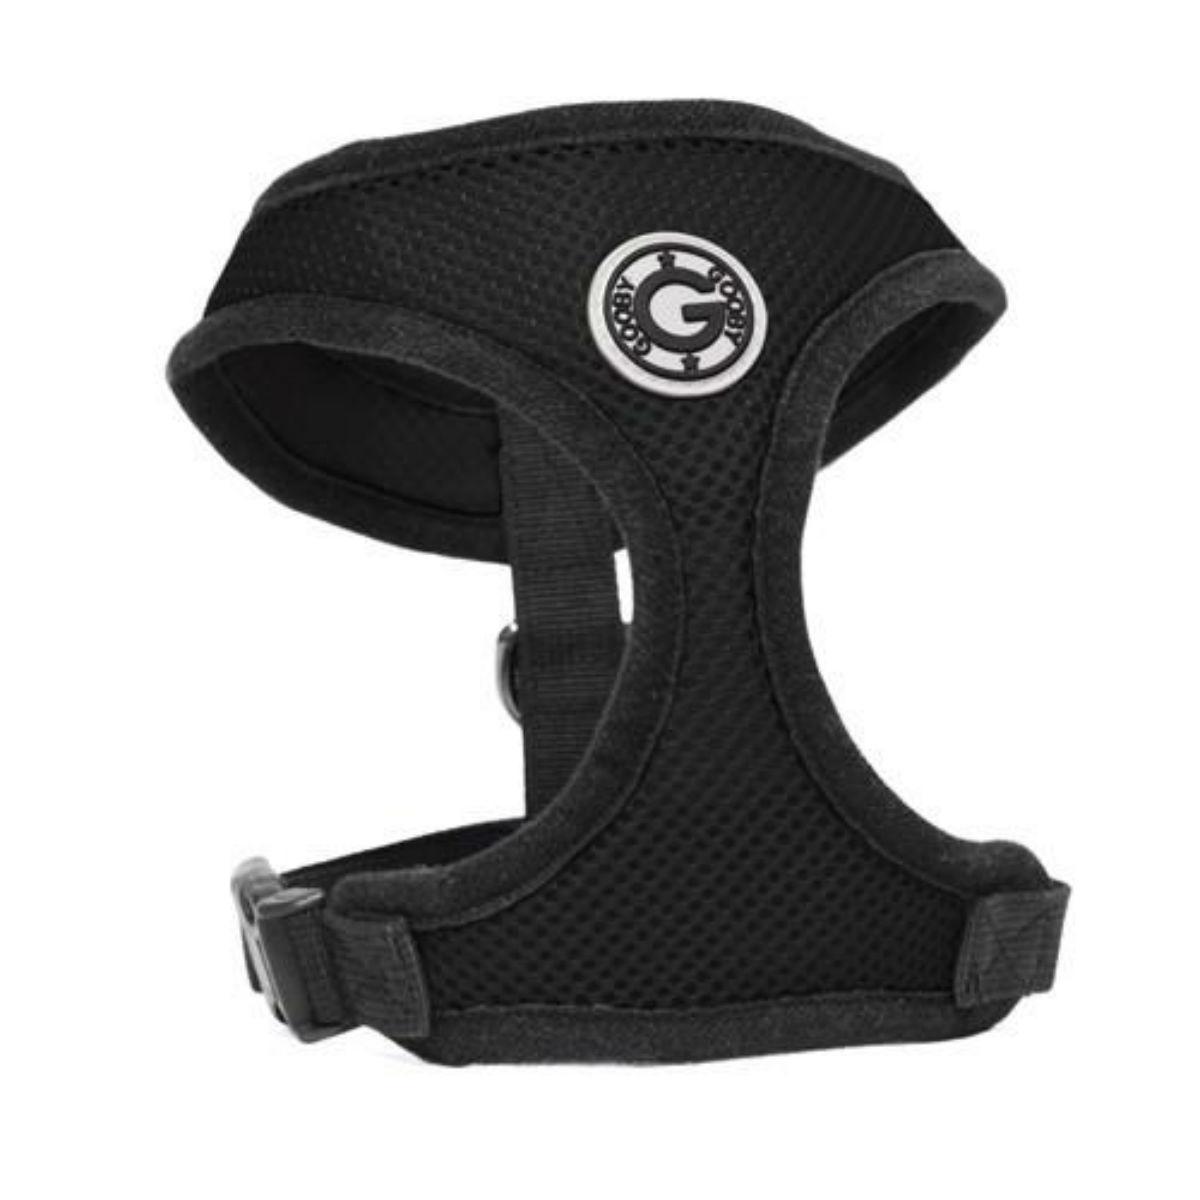 Gooby Soft Mesh Dog Harness - Black